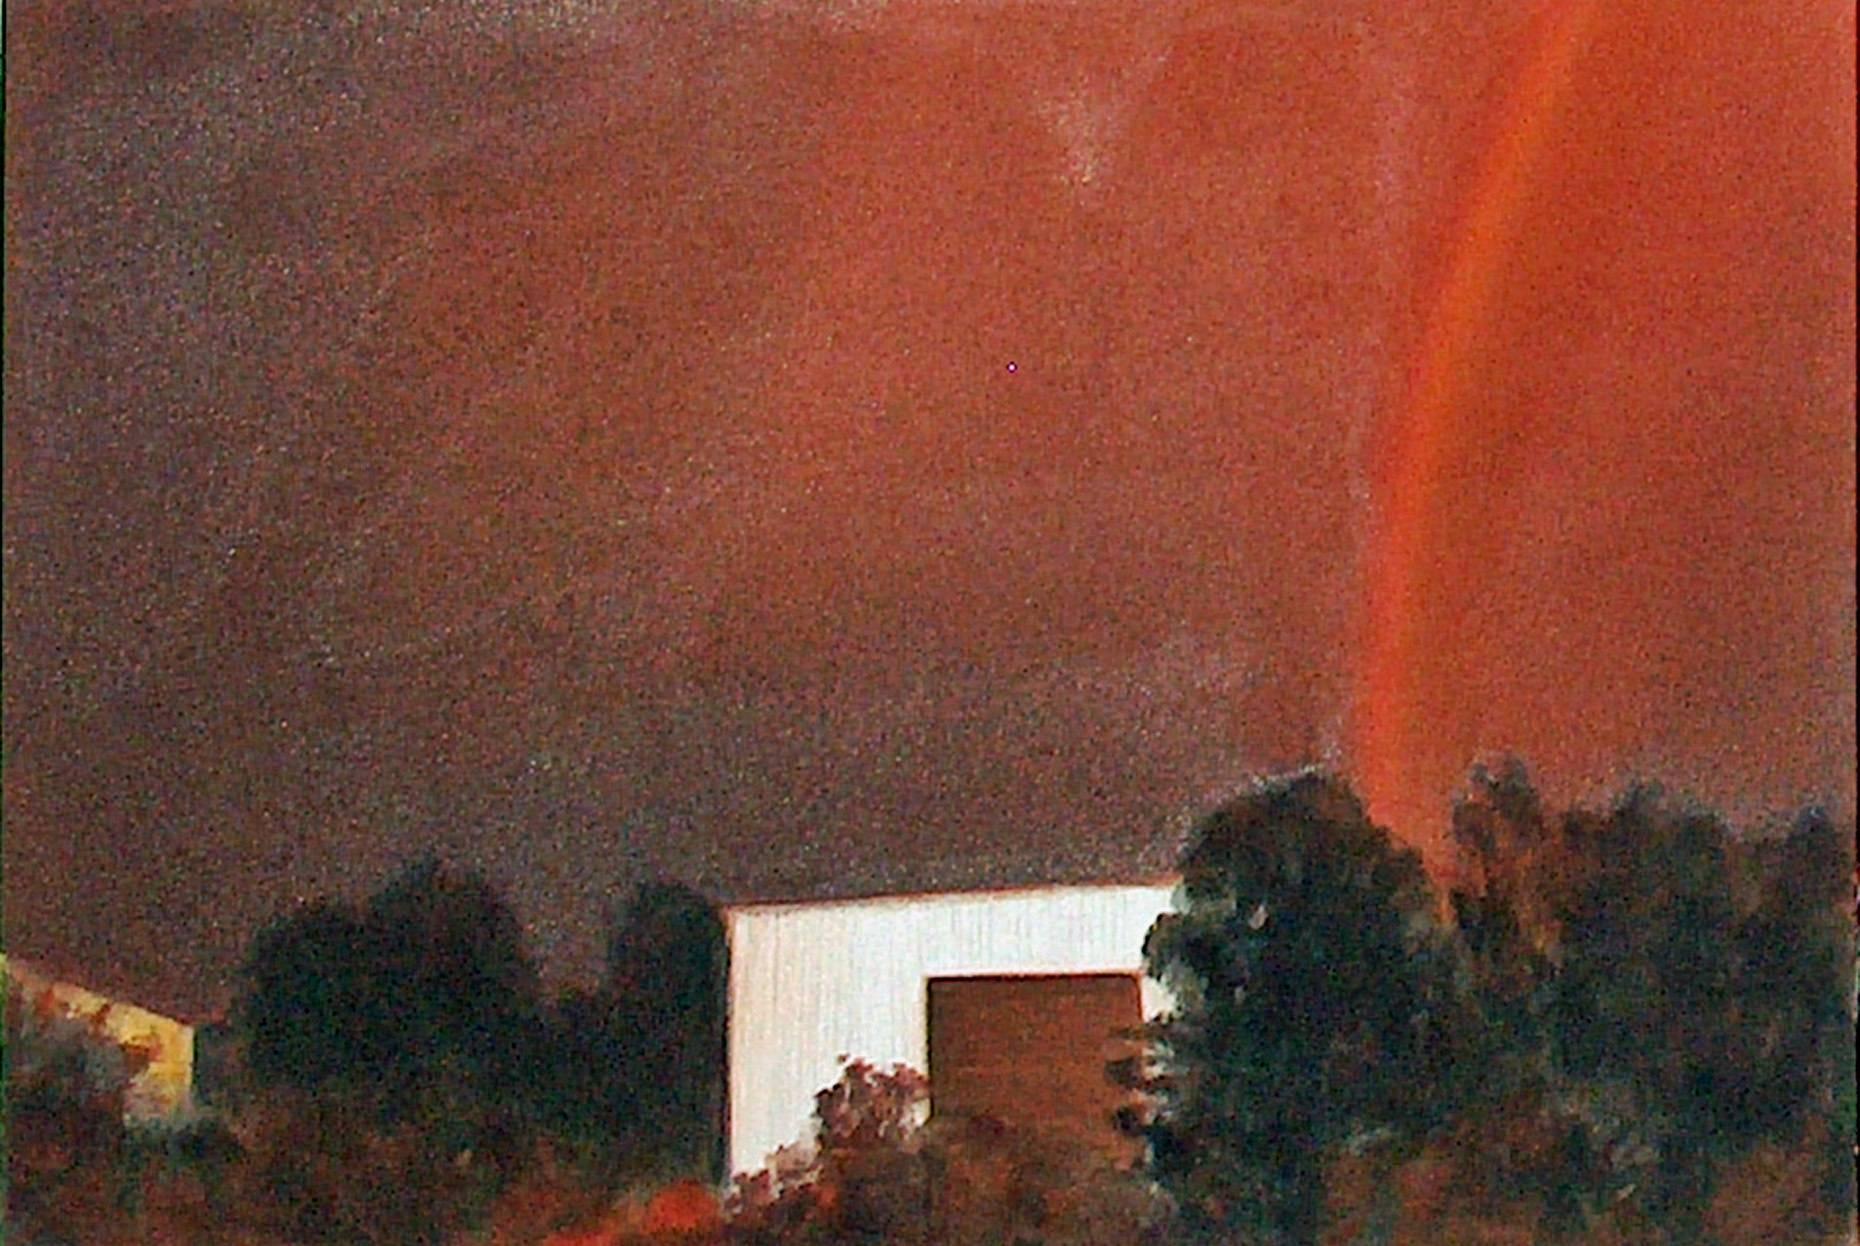 Raketenstation Hombroich 17 1998 Aquarell- u. Acrylfarbe a/Nessel 60 x 90 cm